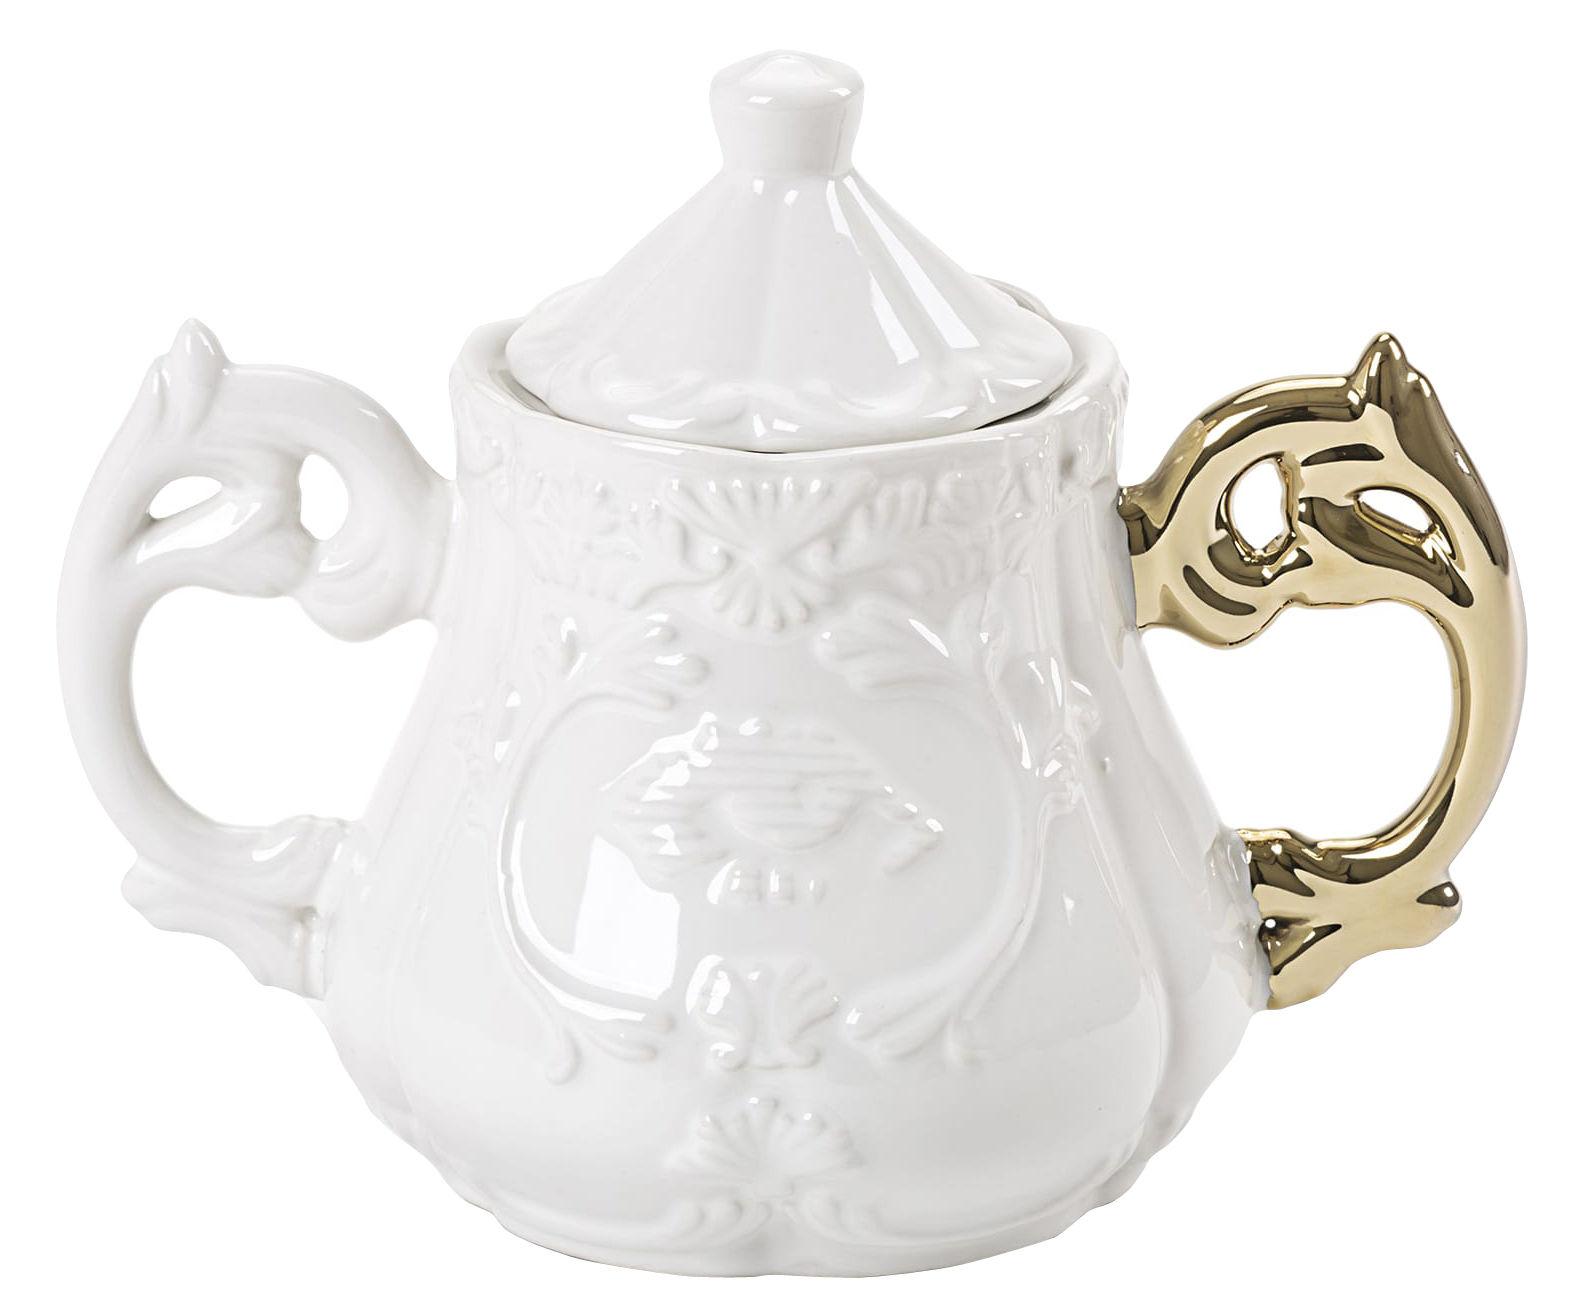 Kitchenware - Sugar Bowls, Milk Pots & Creamers - I-Sugar Sugar bowl by Seletti - White / Gold handle - China